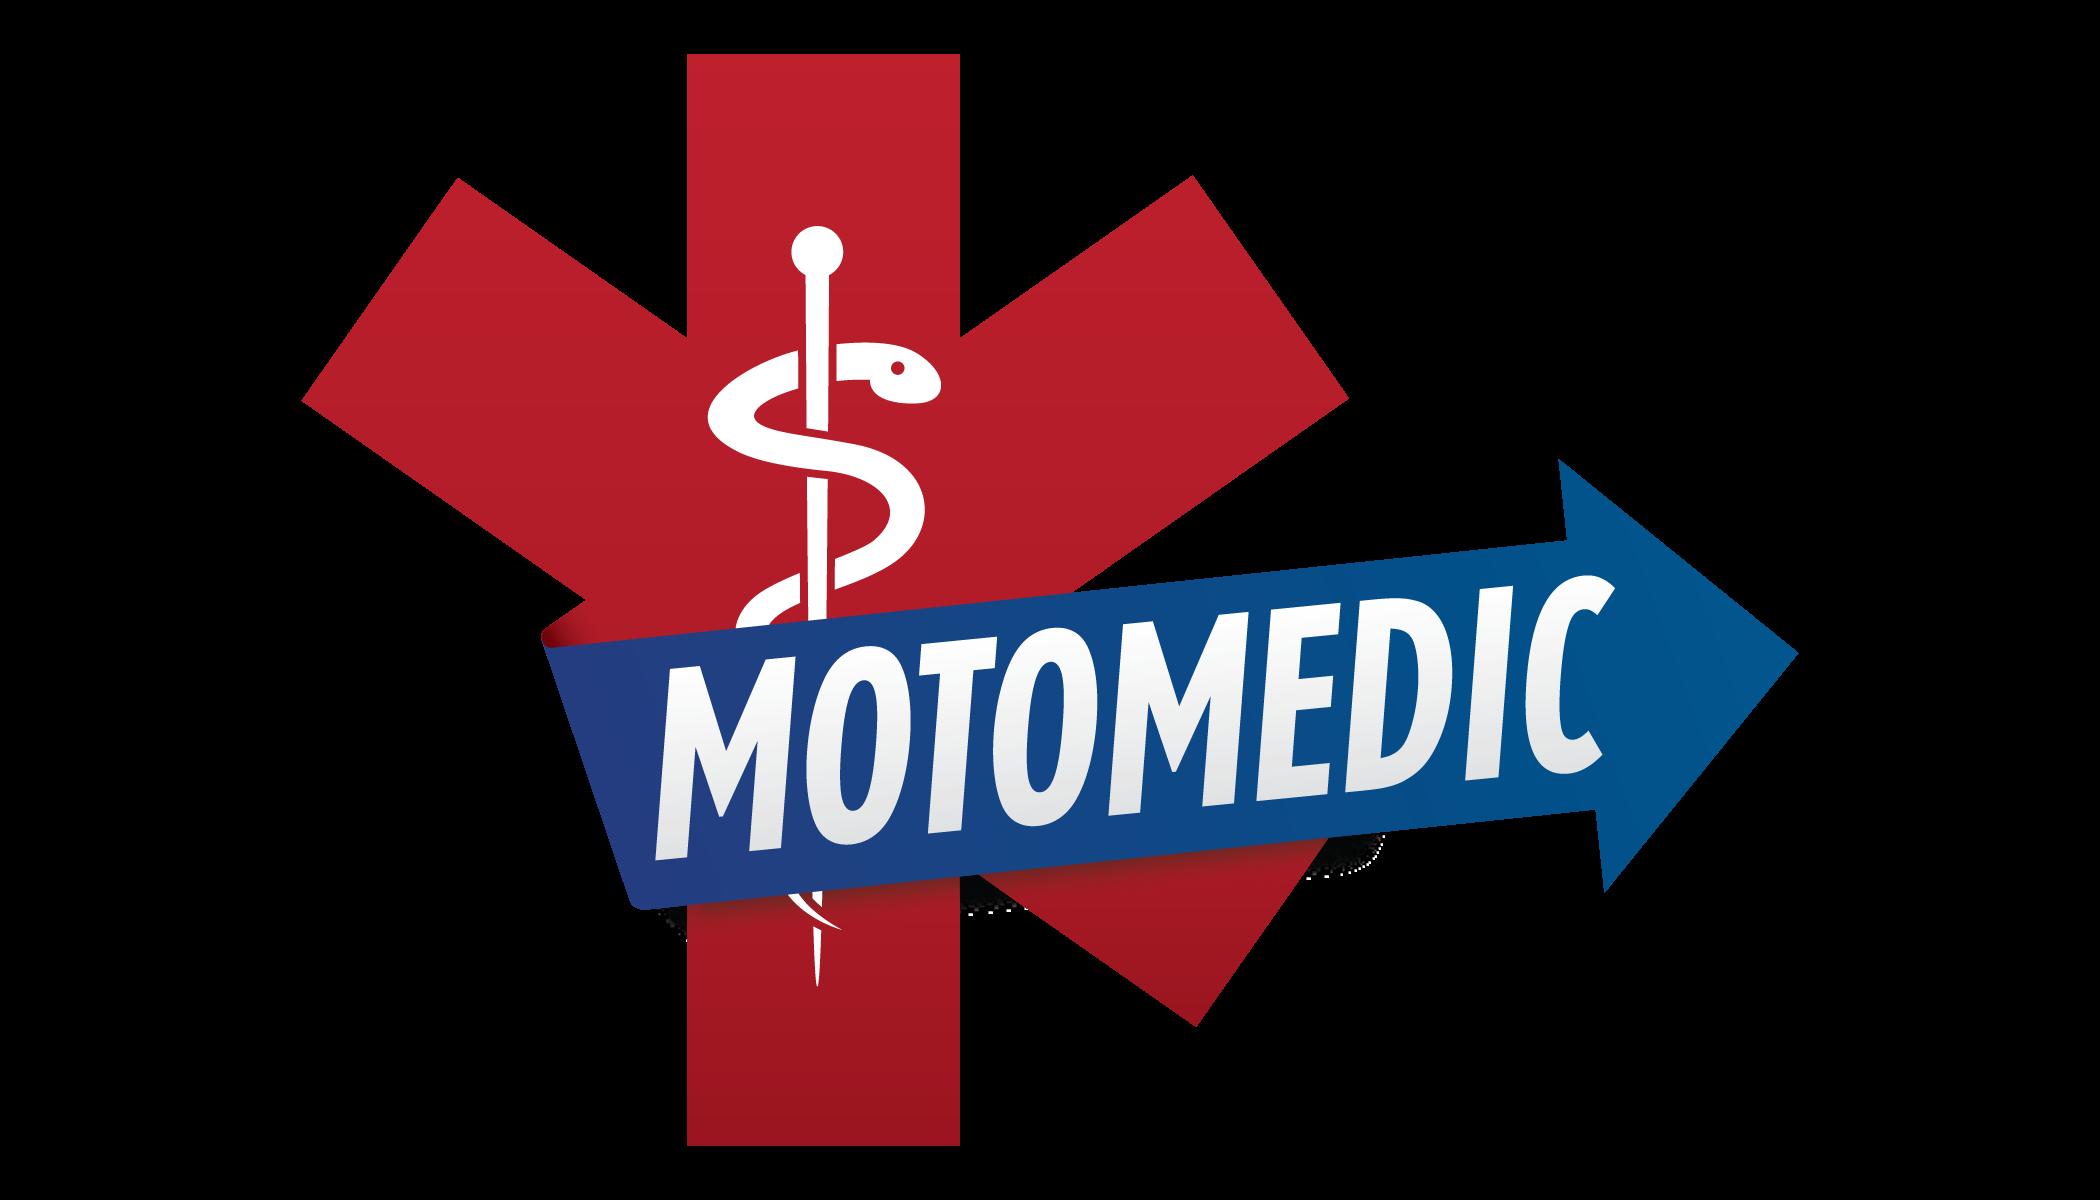 Motomedic-600.png